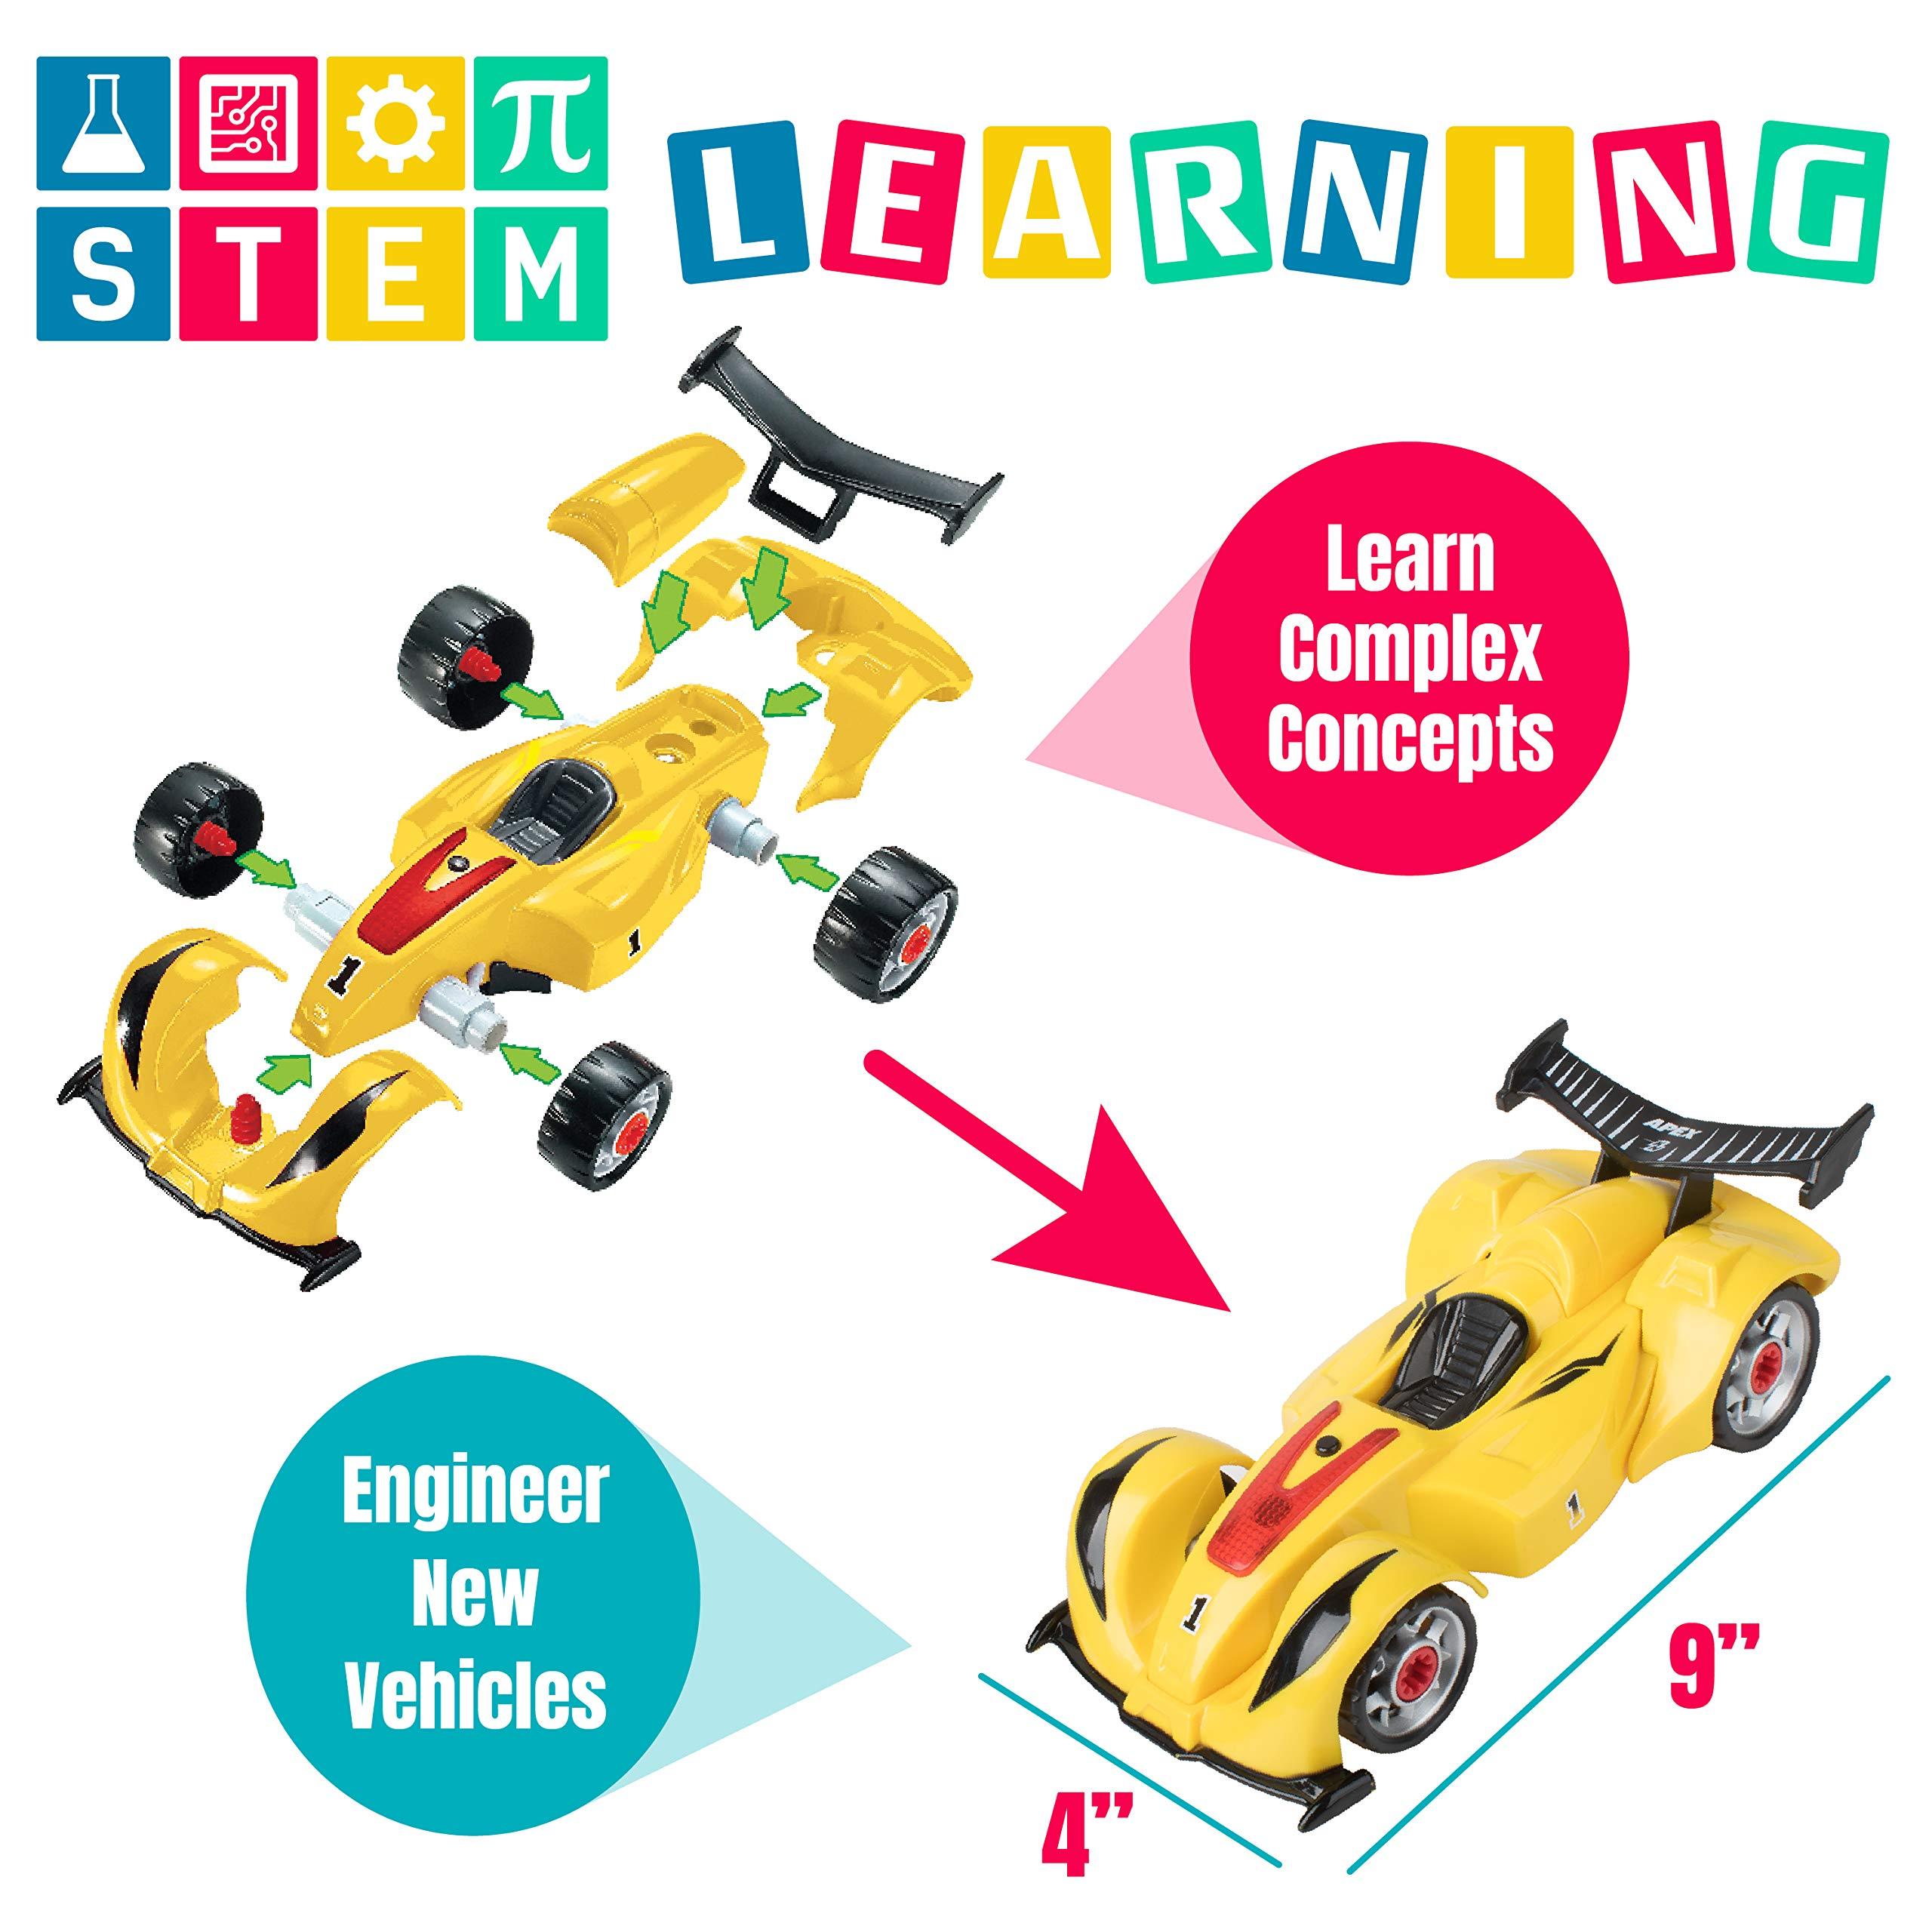 USA Toyz Race Car Take Apart Toys - 52pk Build a Car STEM Building Toys Set, Take Apart Car Building Kits for Kids w/ Car Drill Tool for Boys or Girls by USA Toyz (Image #2)